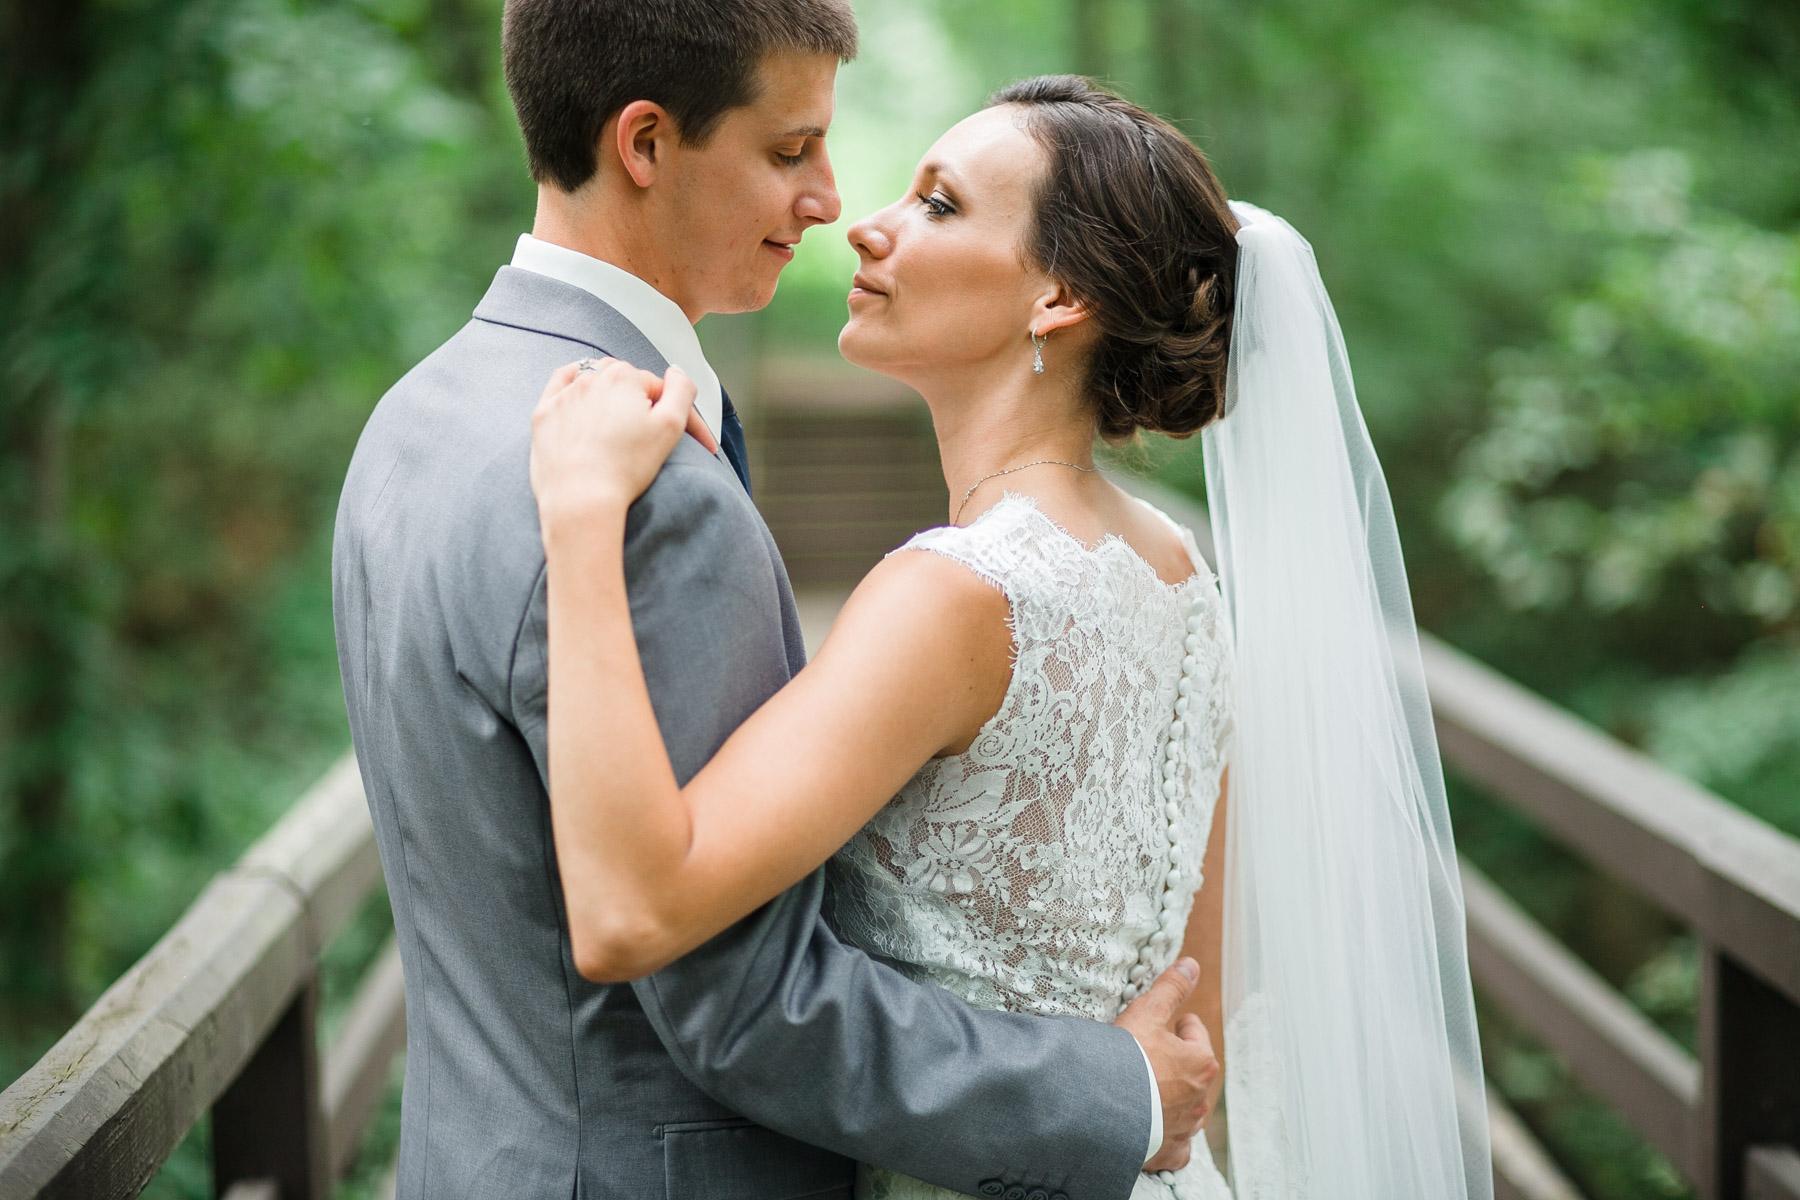 wildwood-park-wedding-photos-59.jpg